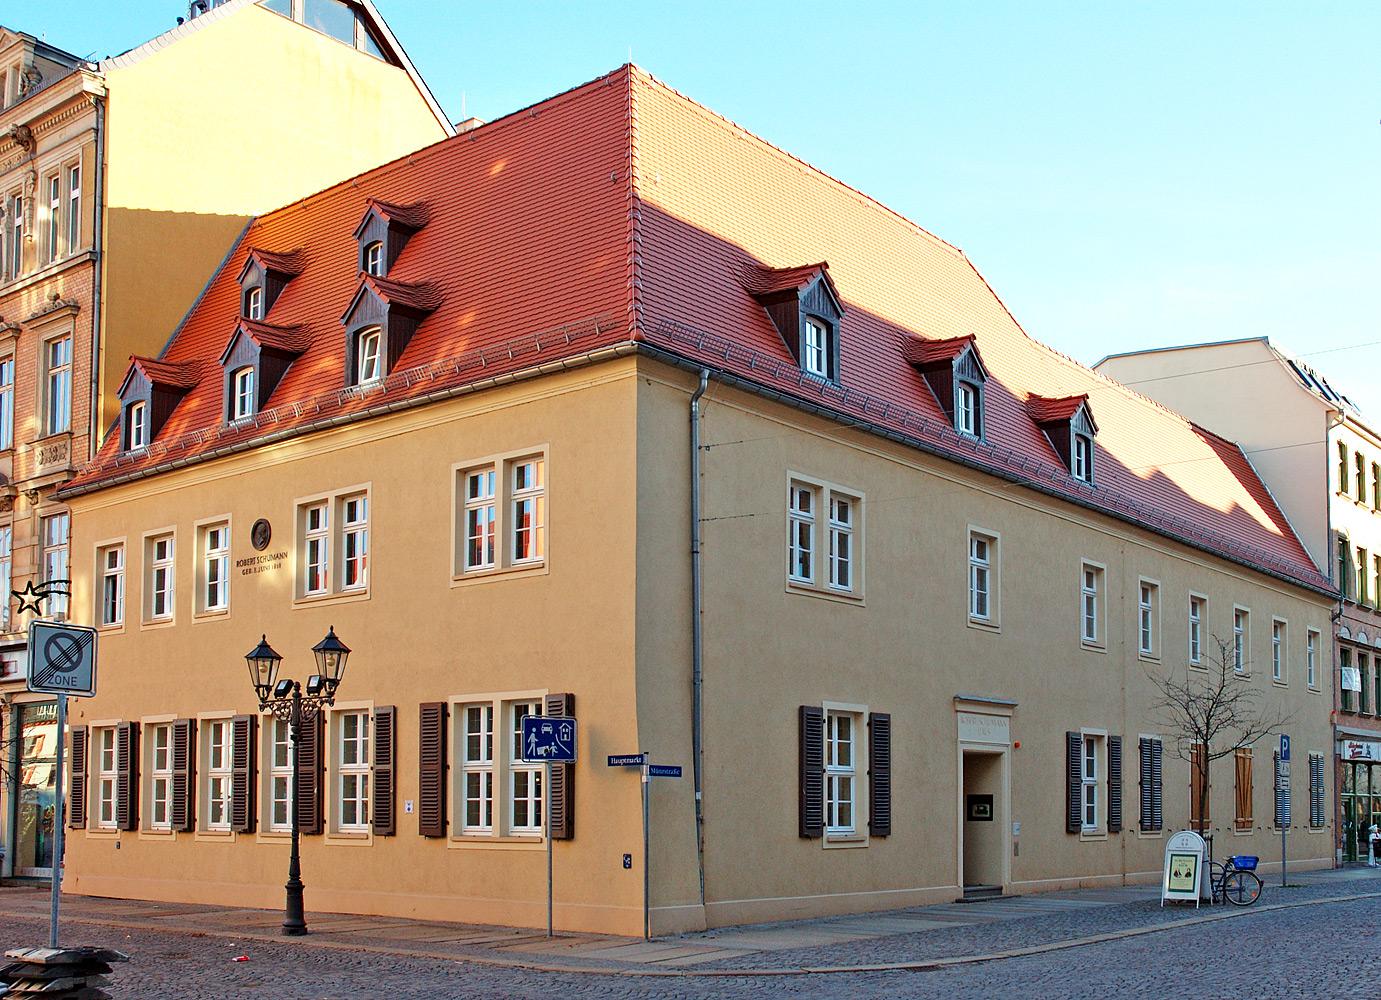 Lugar de nacimiento de Robert Schumann en Zwickau.